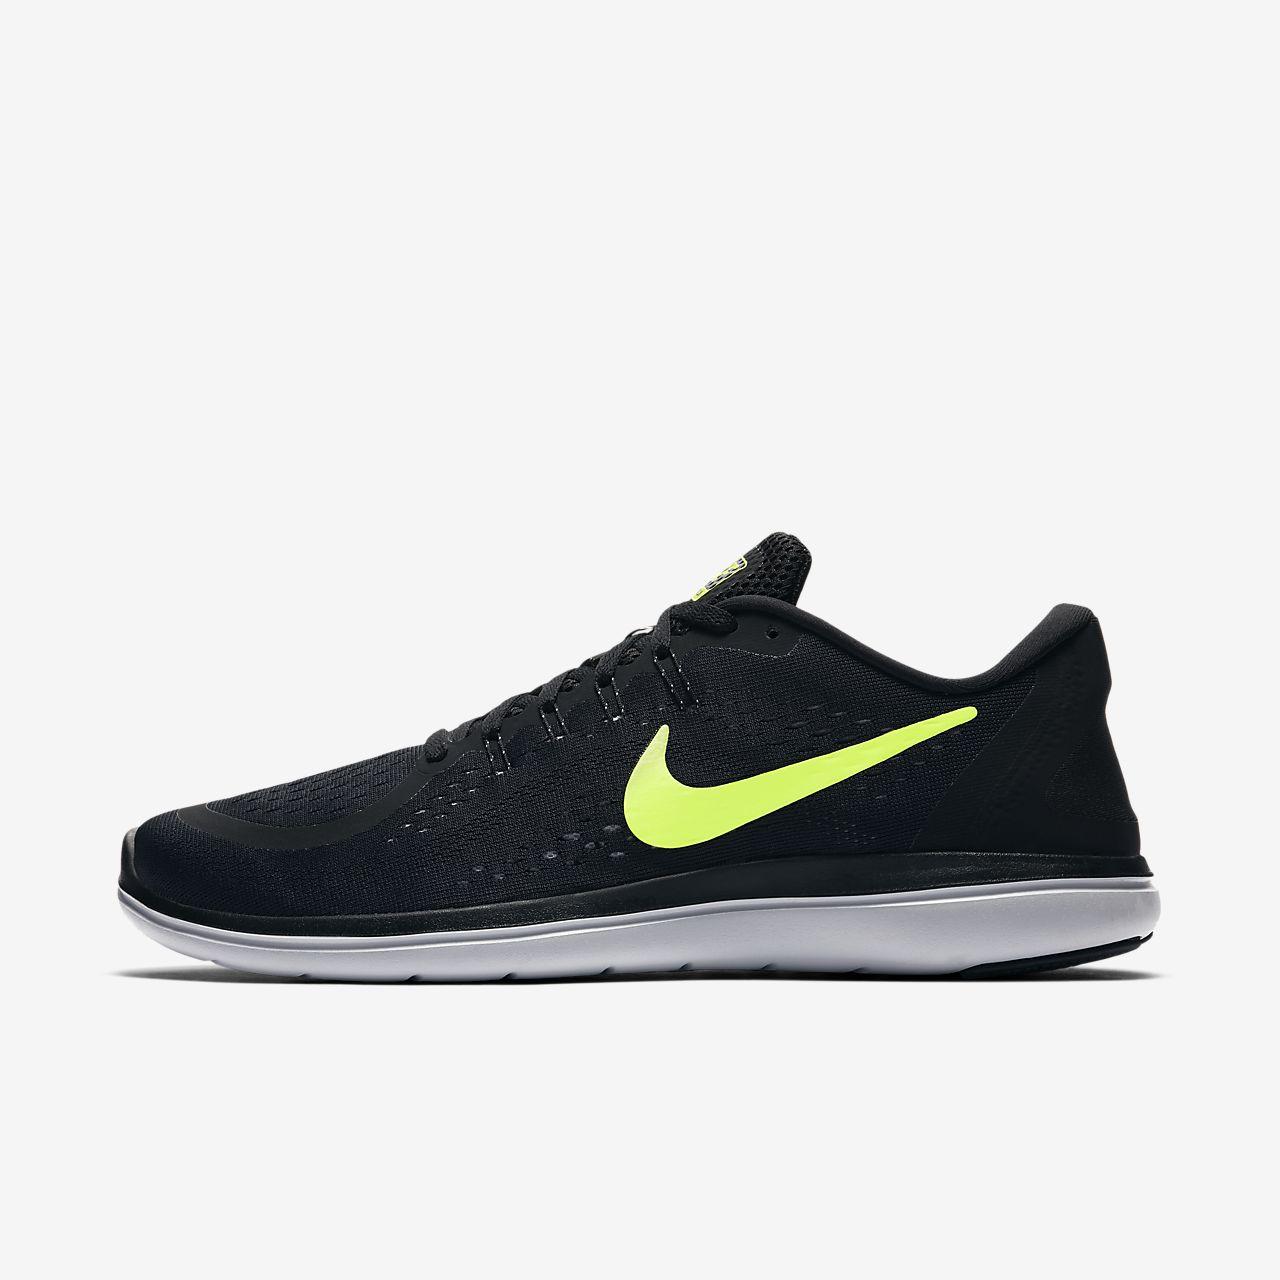 Nike Flex 2017 Hommes Rn Course Vente Chaussures prix incroyable rabais PROMOS originale sortie Fqi7o6qlV